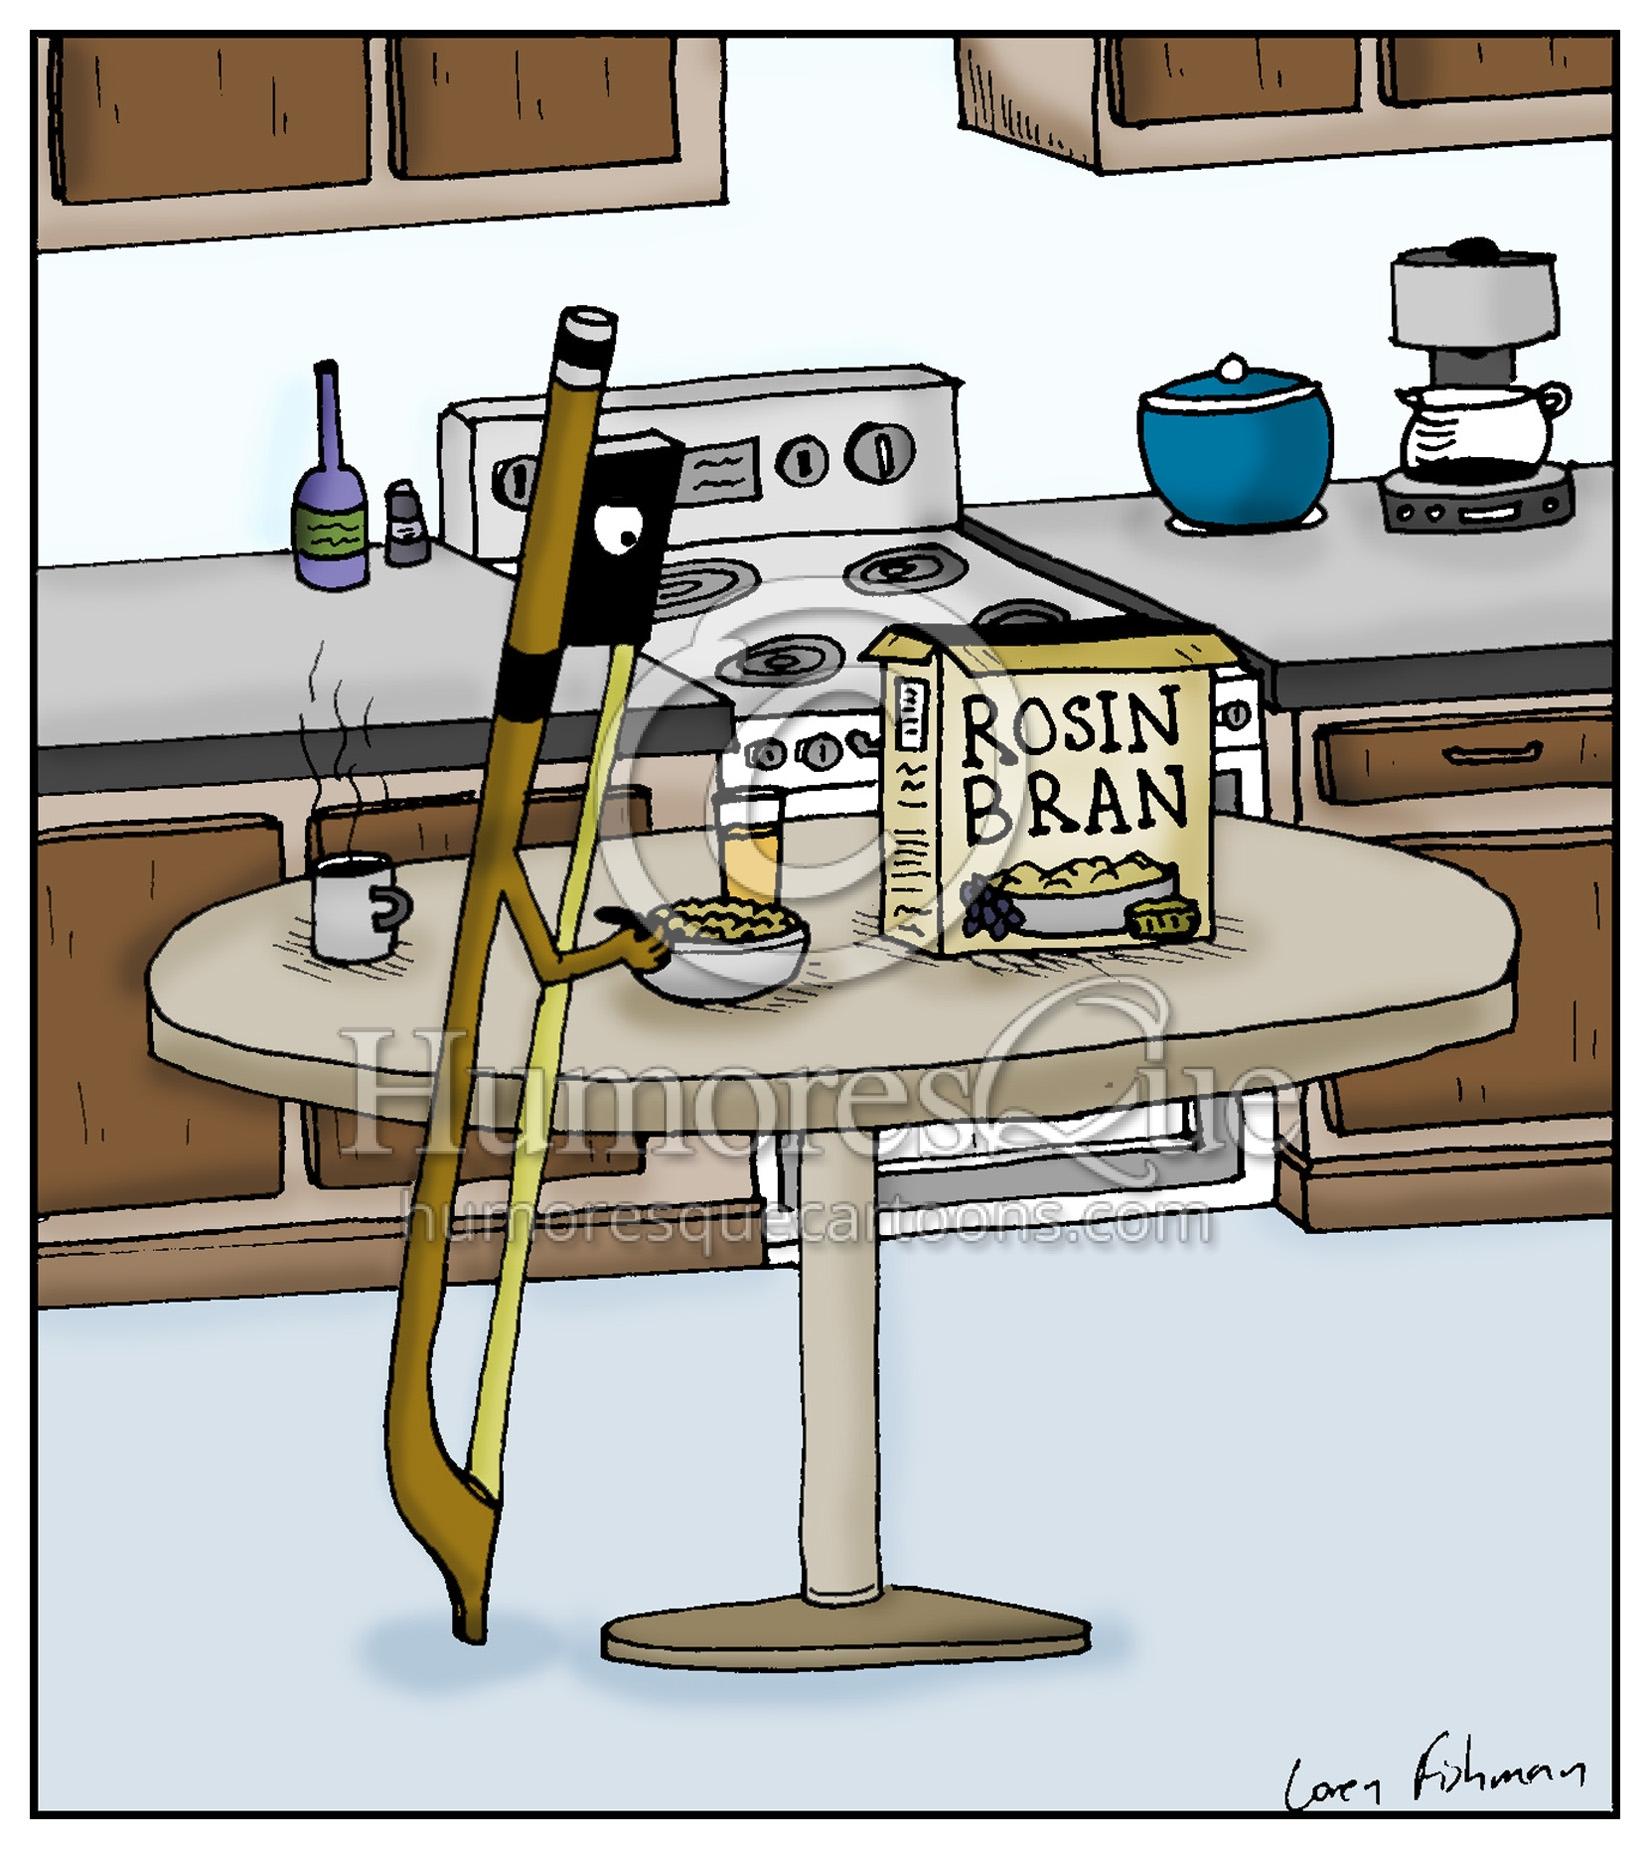 rosin bran bow eating rosin cereal strings cartoon